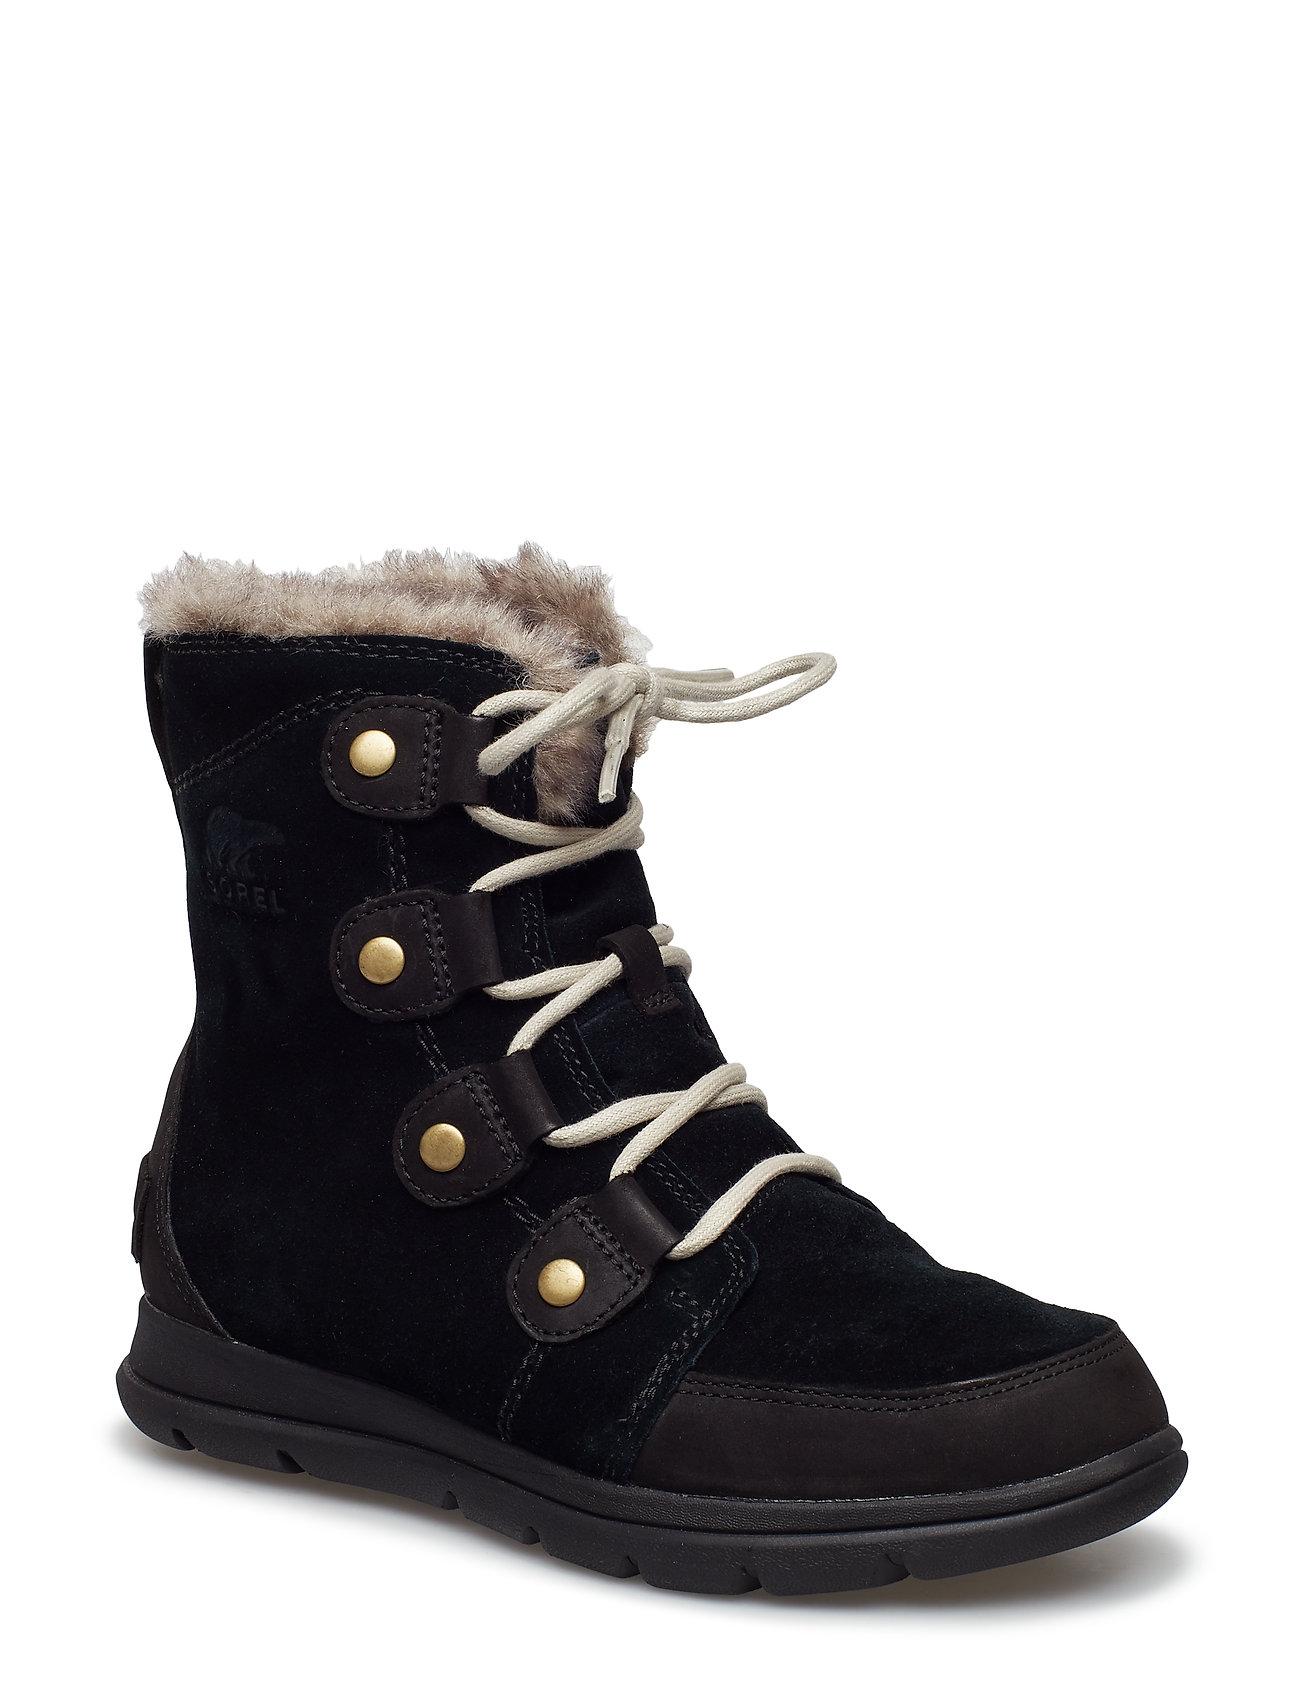 Image of Sorel™ Explorer Joan Shoes Boots Ankle Boots Ankle Boot - Flat Sort Sorel (3406155251)